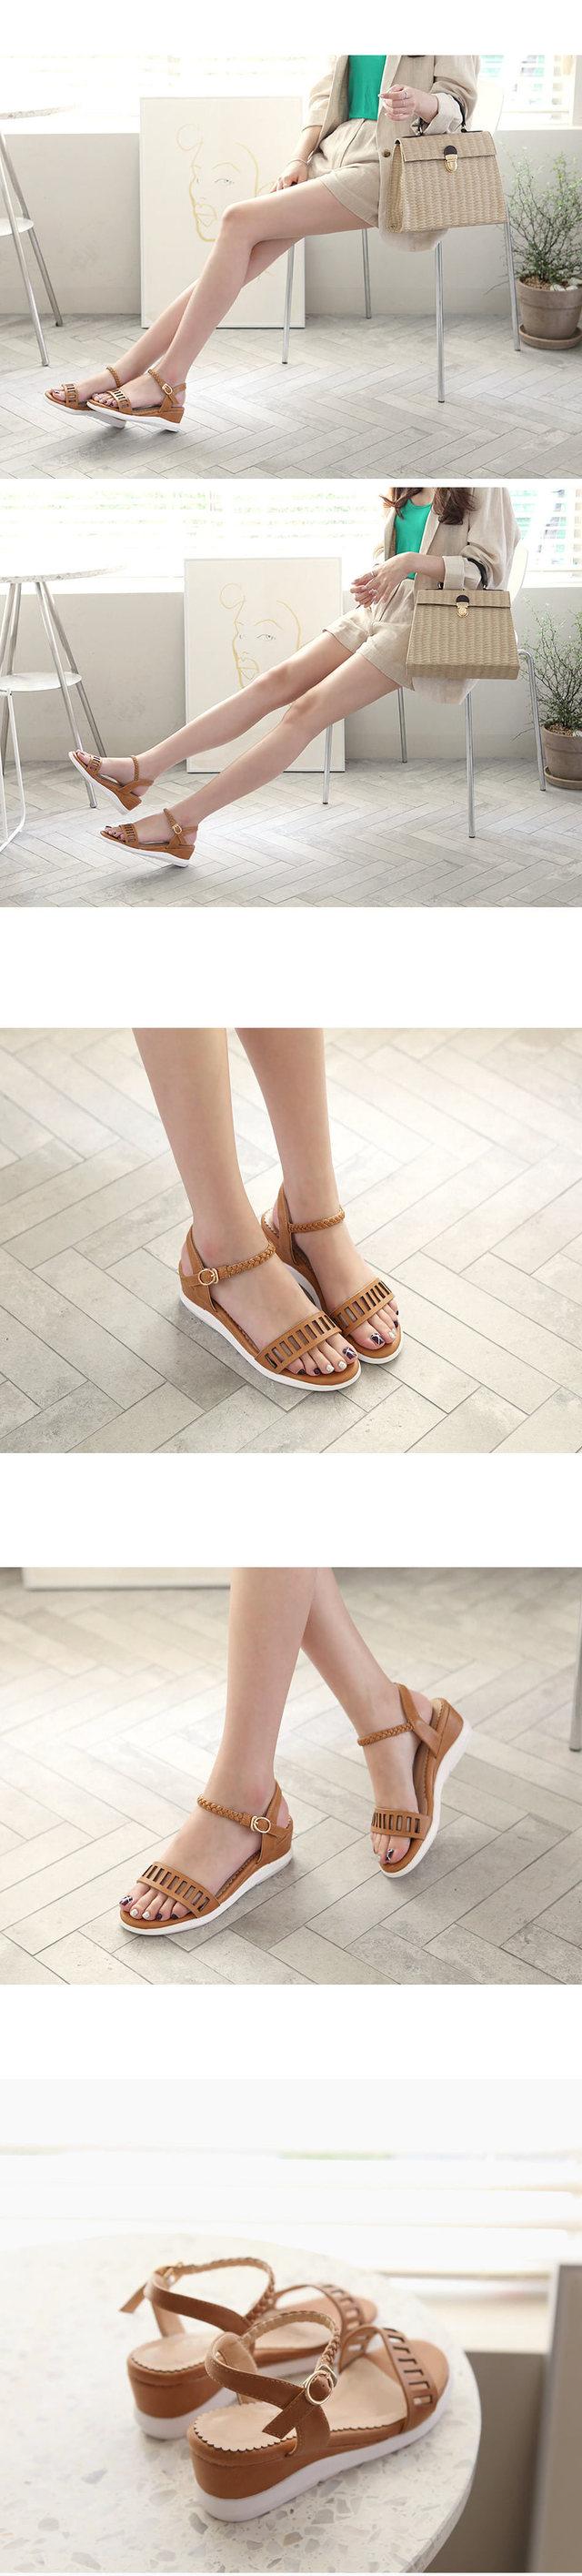 Hillson wedge sandals 5cm